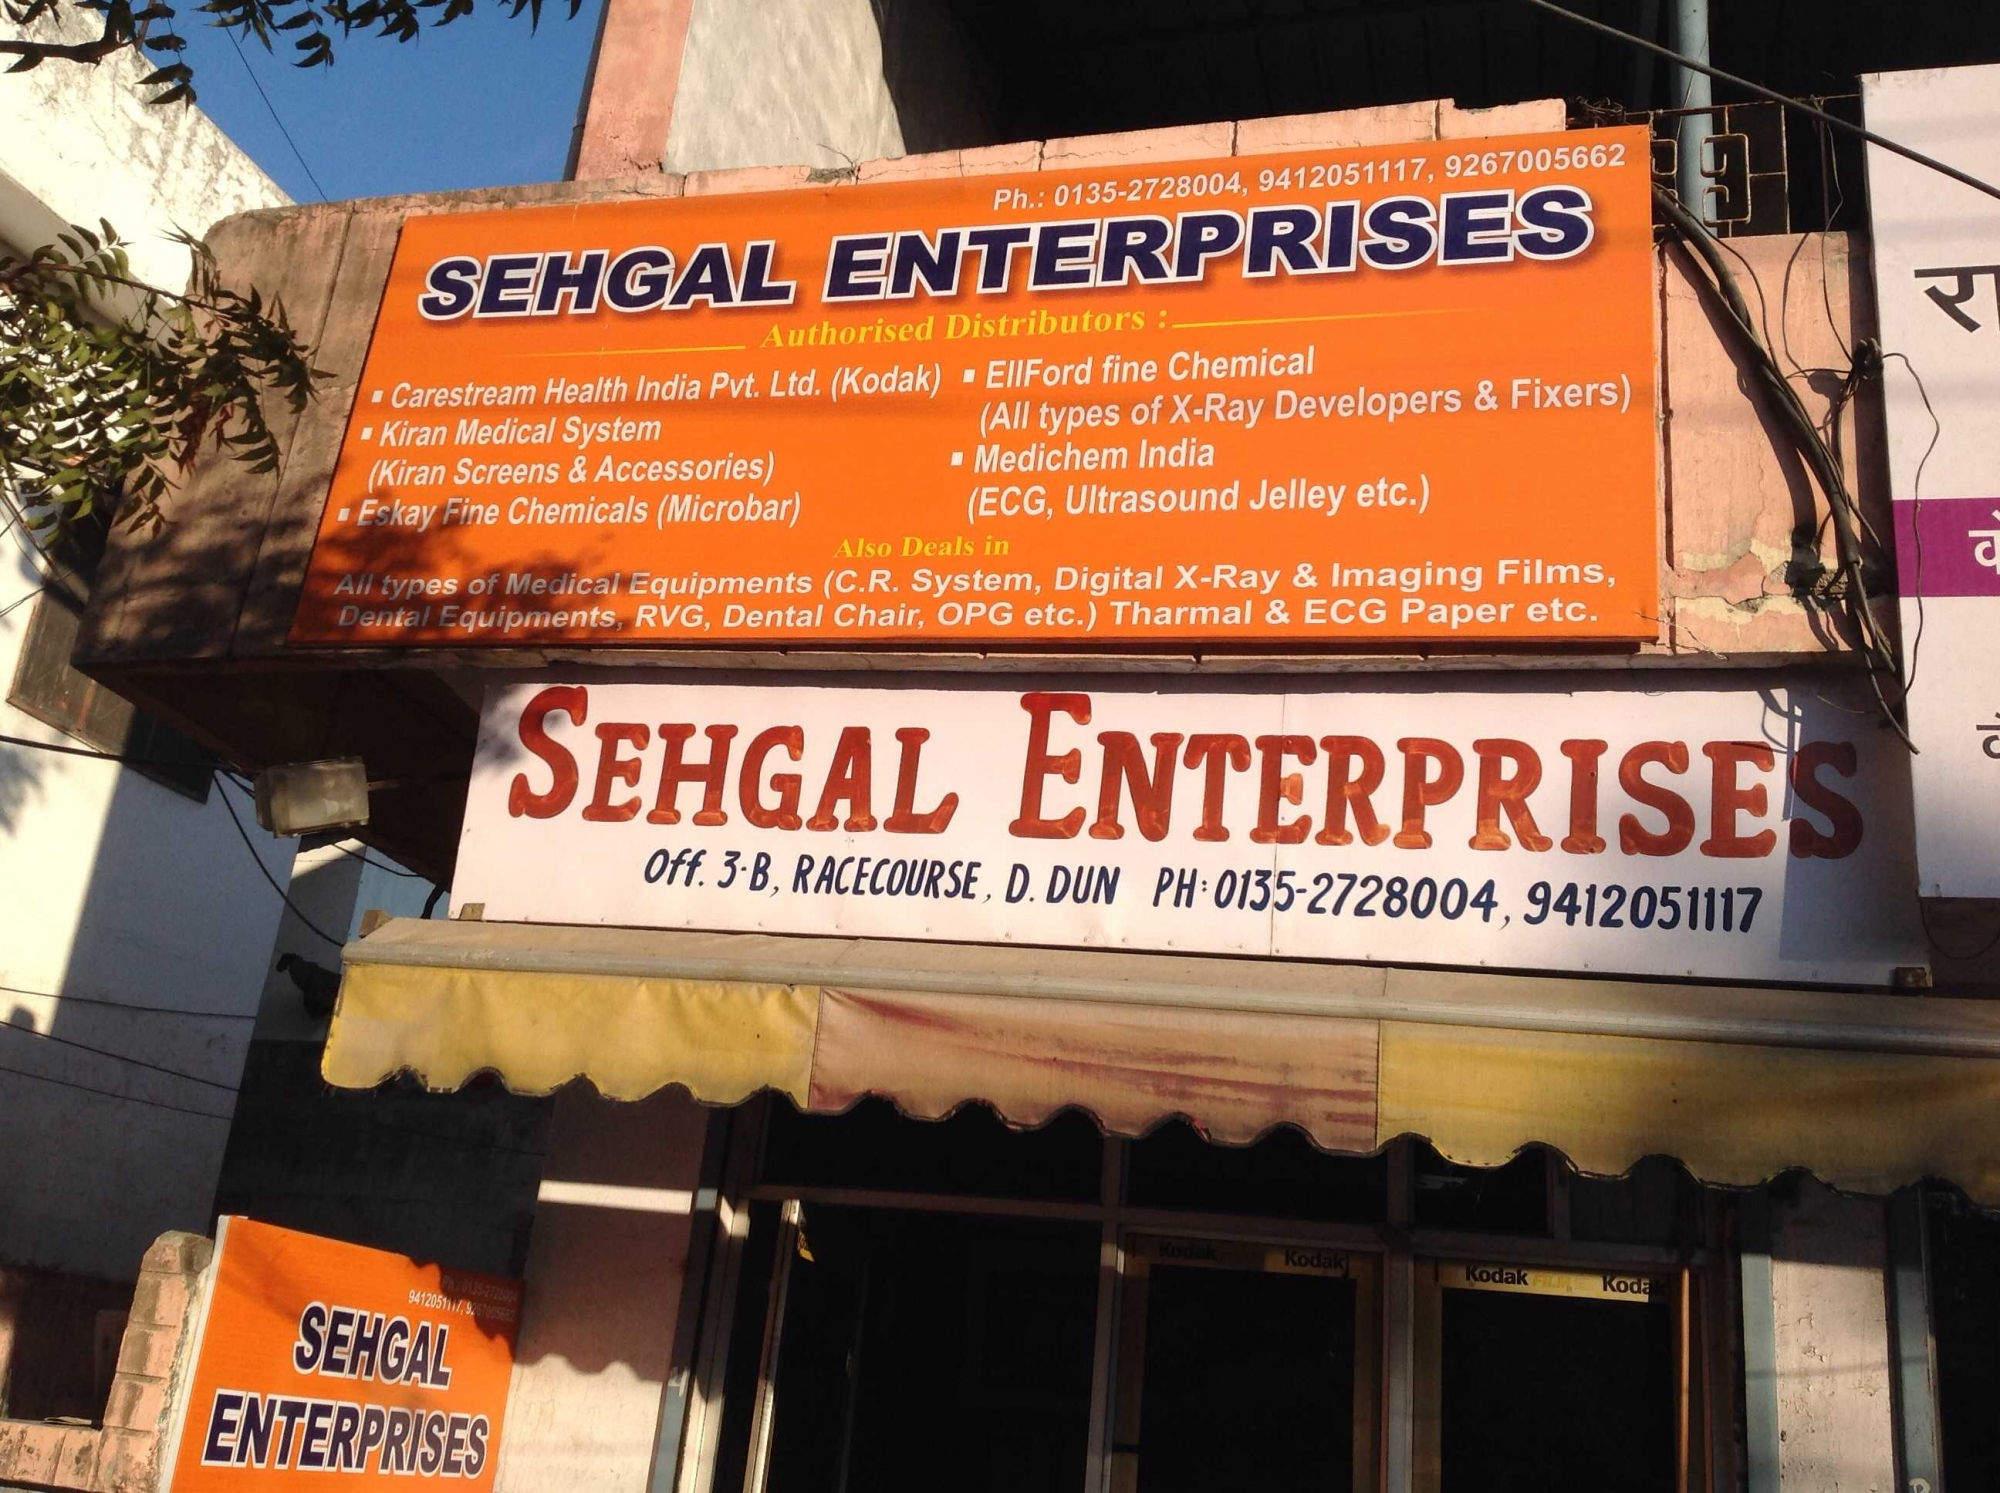 Top Dental Rvg Dealers in Dehradun City - Best Dental Rvg System